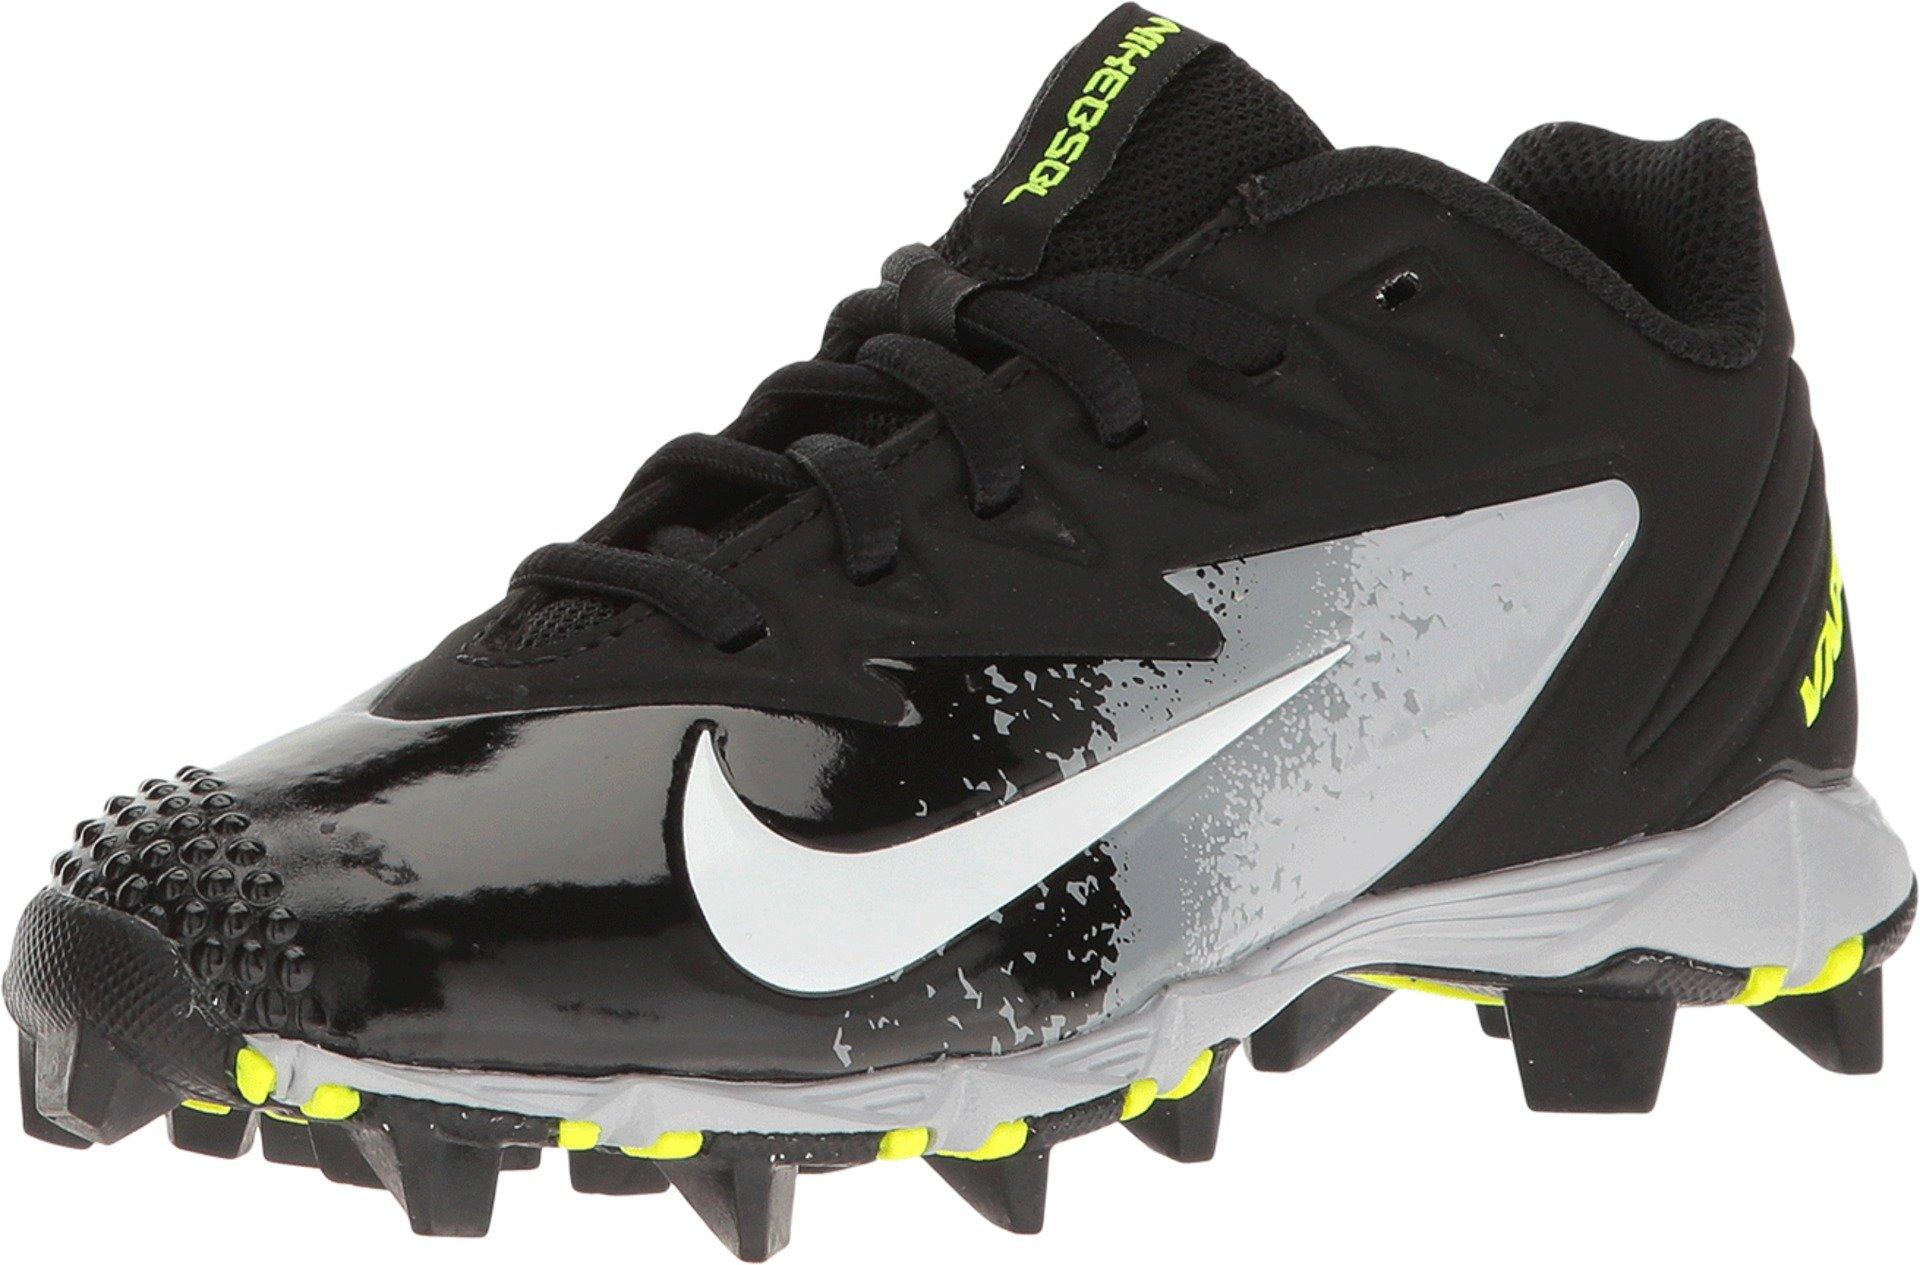 Nike Boy's Vapor Ultrafly Keystone Baseball Cleat Black/White/Wolf Grey/Cool Grey Size 5.5 M US